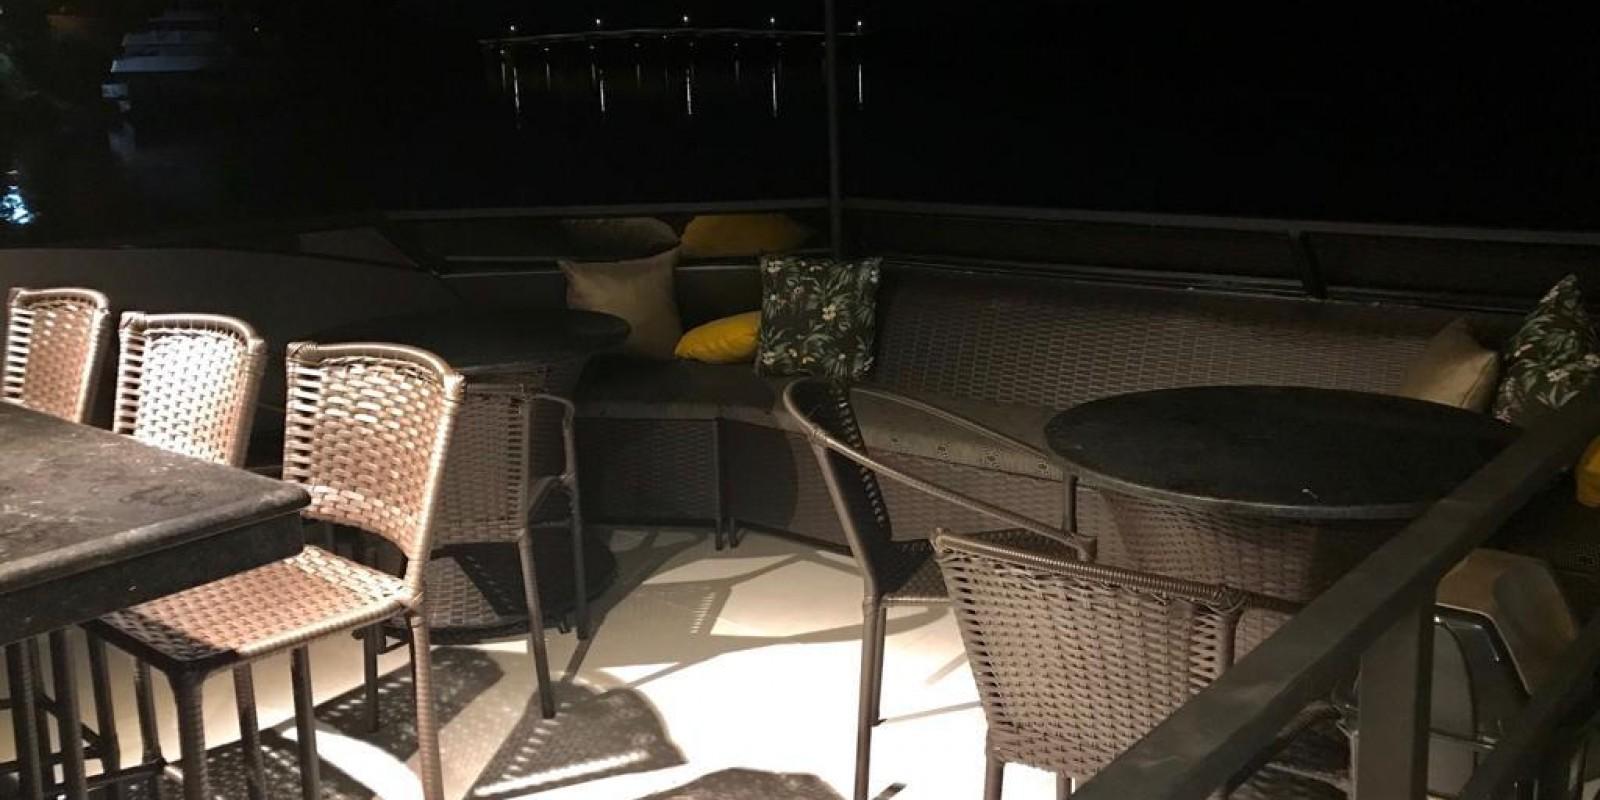 Barco Hotel Golden Fishing - Caceres. - Foto 12 de 17